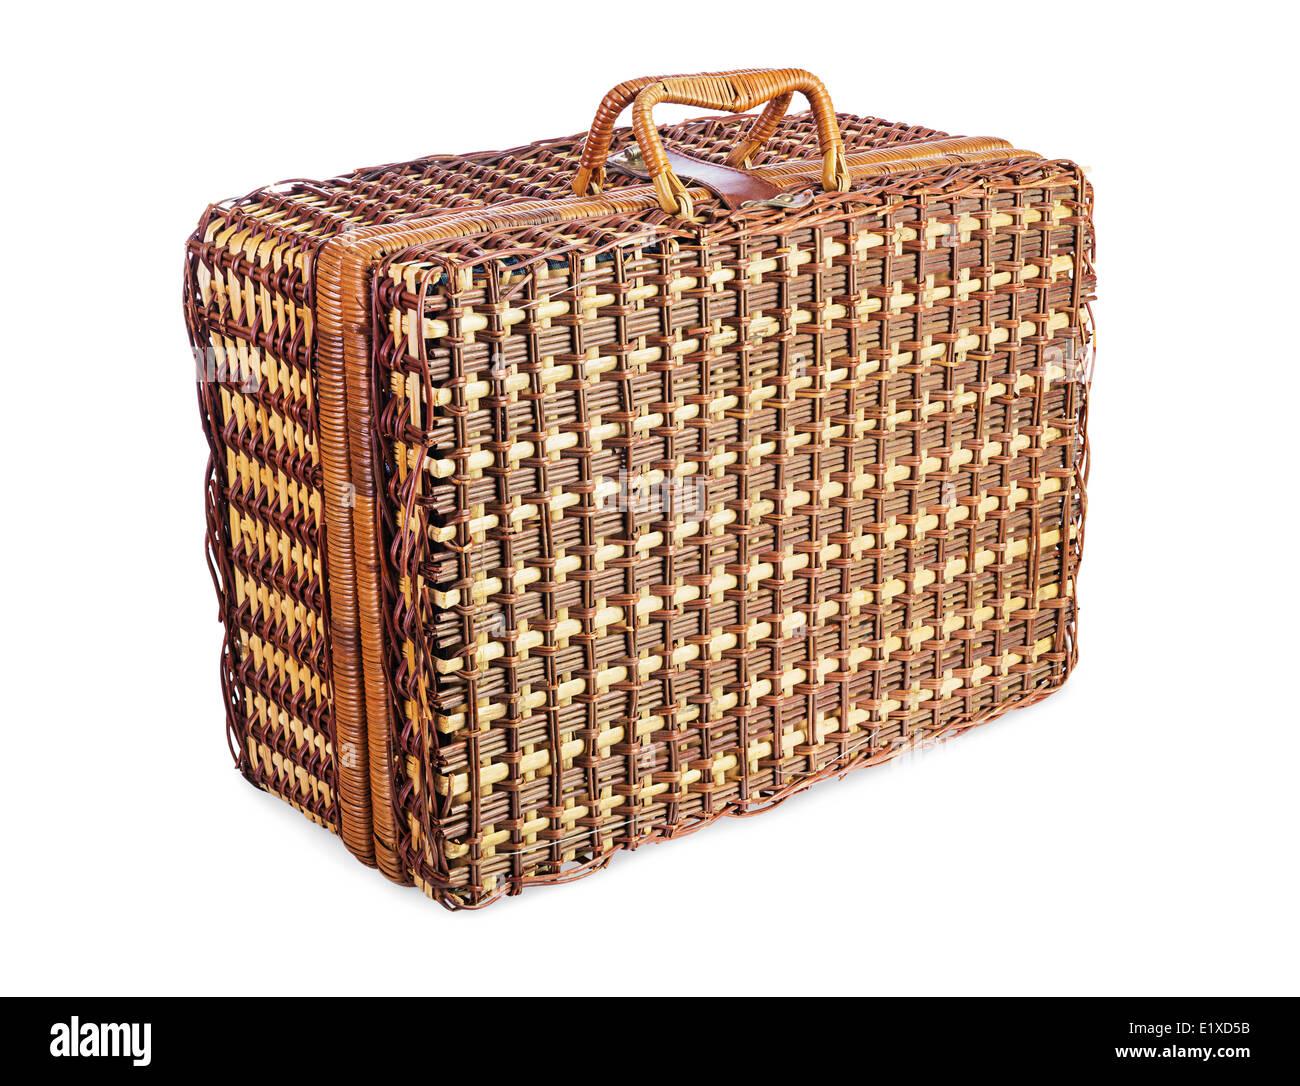 wooden suitcase photos wooden suitcase images alamy. Black Bedroom Furniture Sets. Home Design Ideas